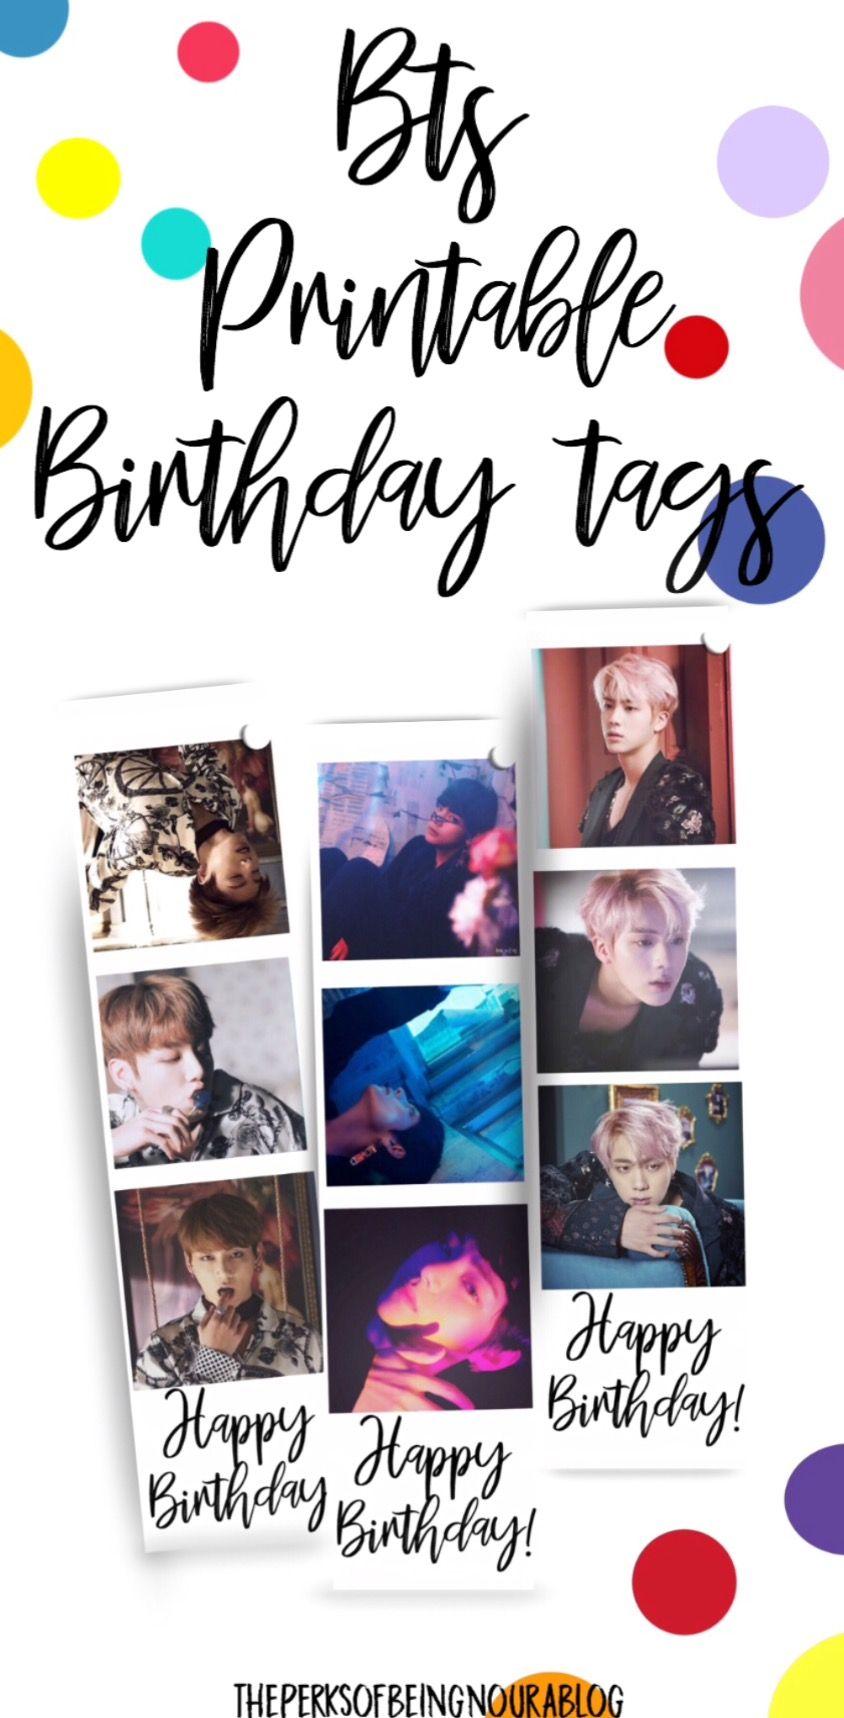 Free Printable Bts Birthday Tags Bts Birthdays Birthday Card Printable Birthday Tags